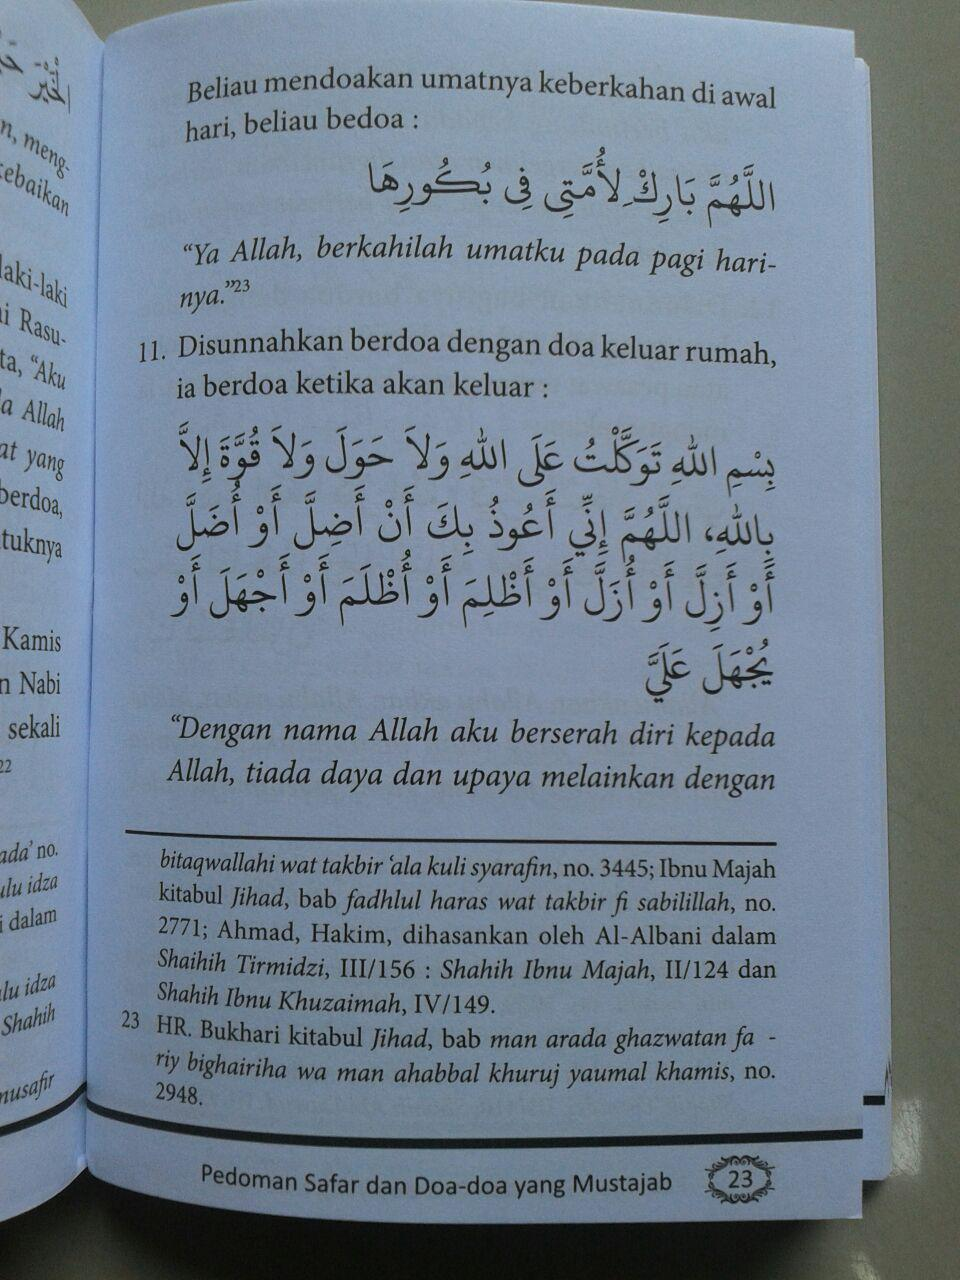 Buku Saku Pedoman Safar Doa Doa Yang Mustajab & Adab Adab Musafir isi